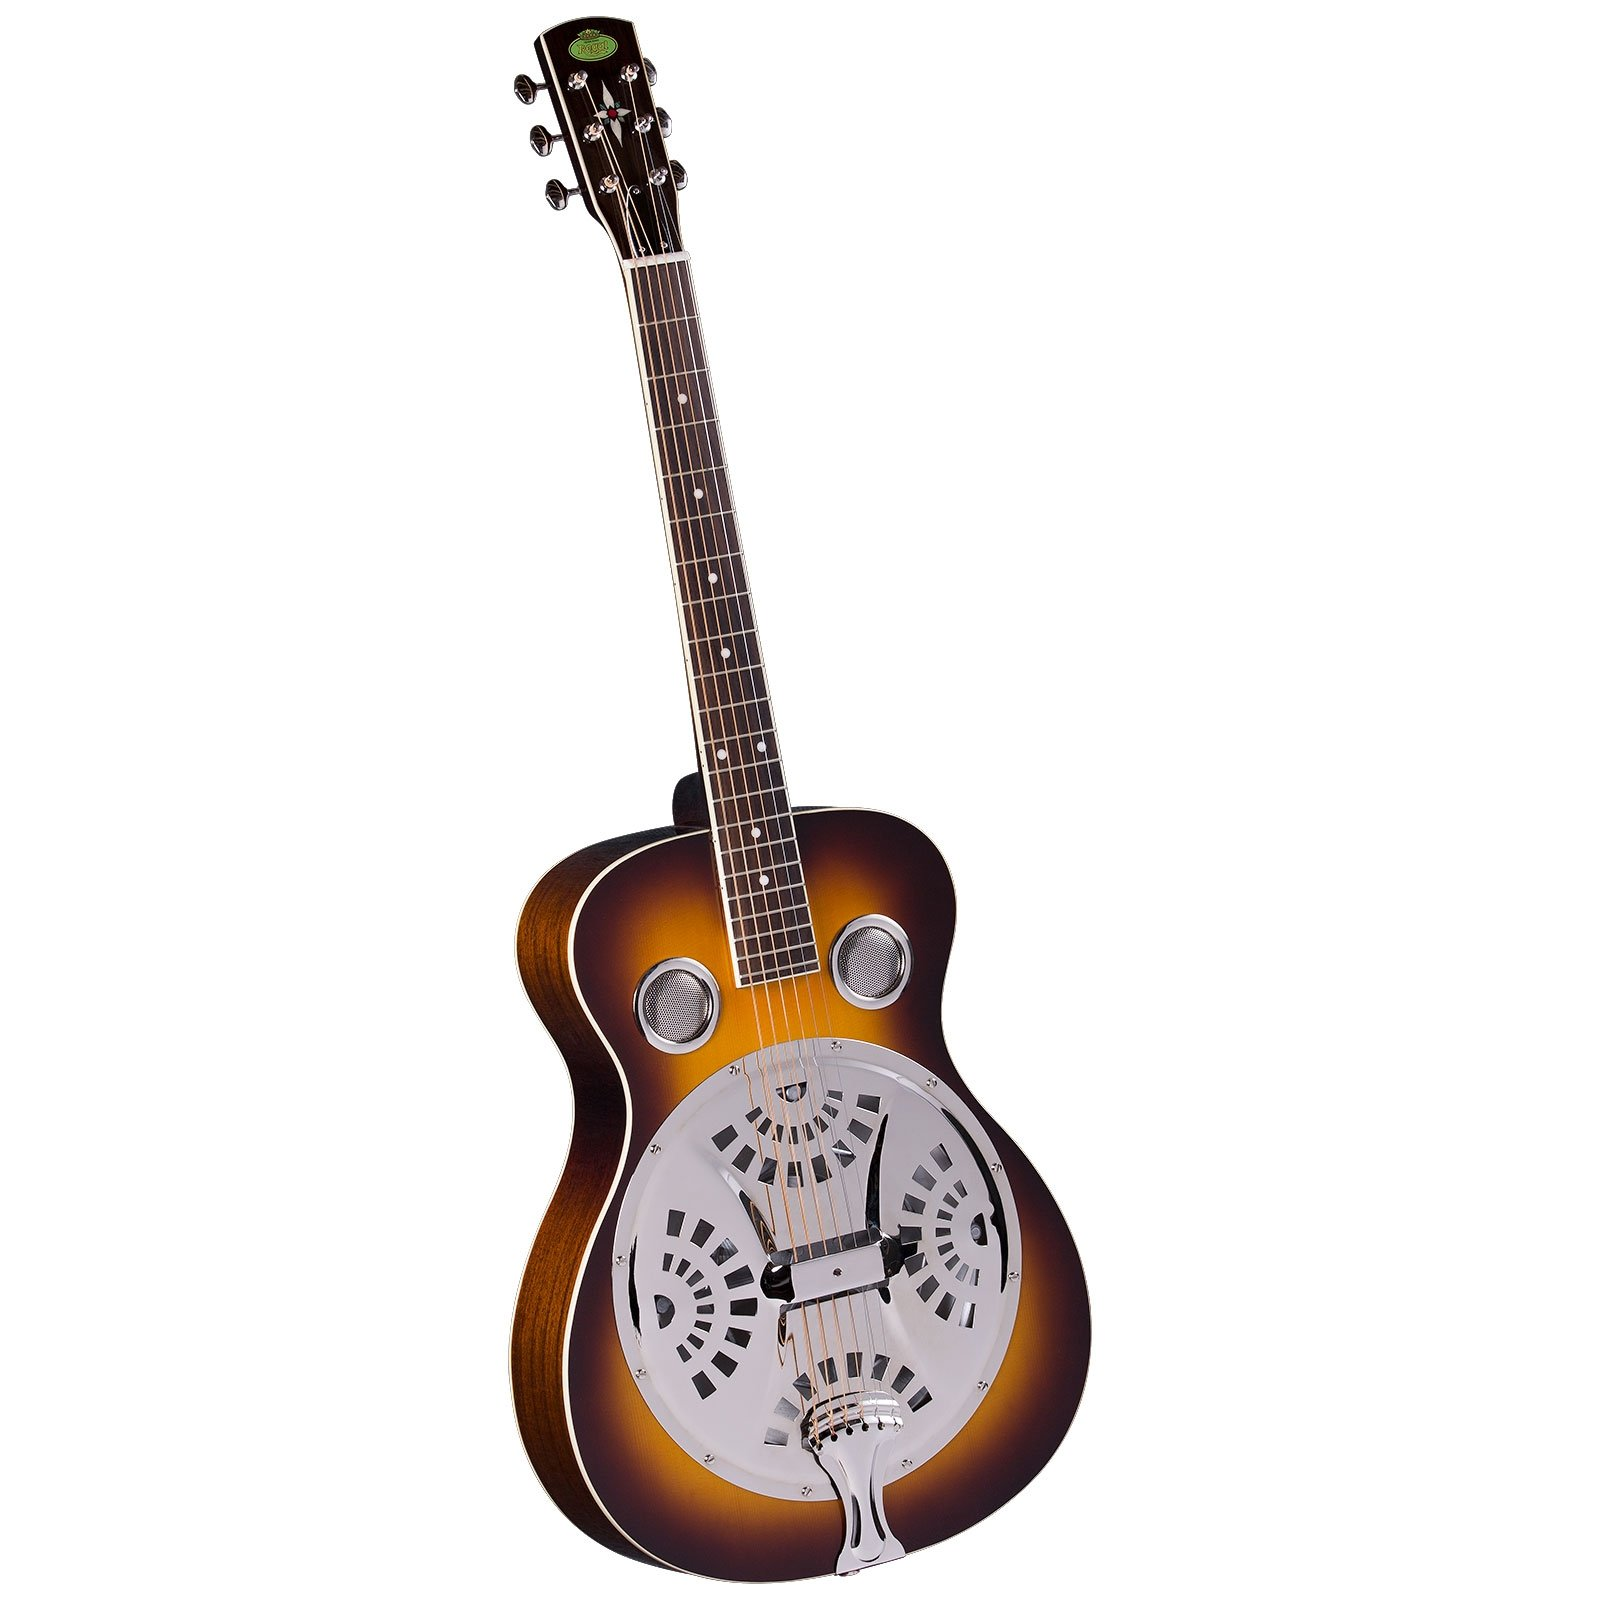 Regal RD-40V Studio Series Roundneck Resophonic Guitar - Vintage Sunburst by Regal Resophonic Guitars